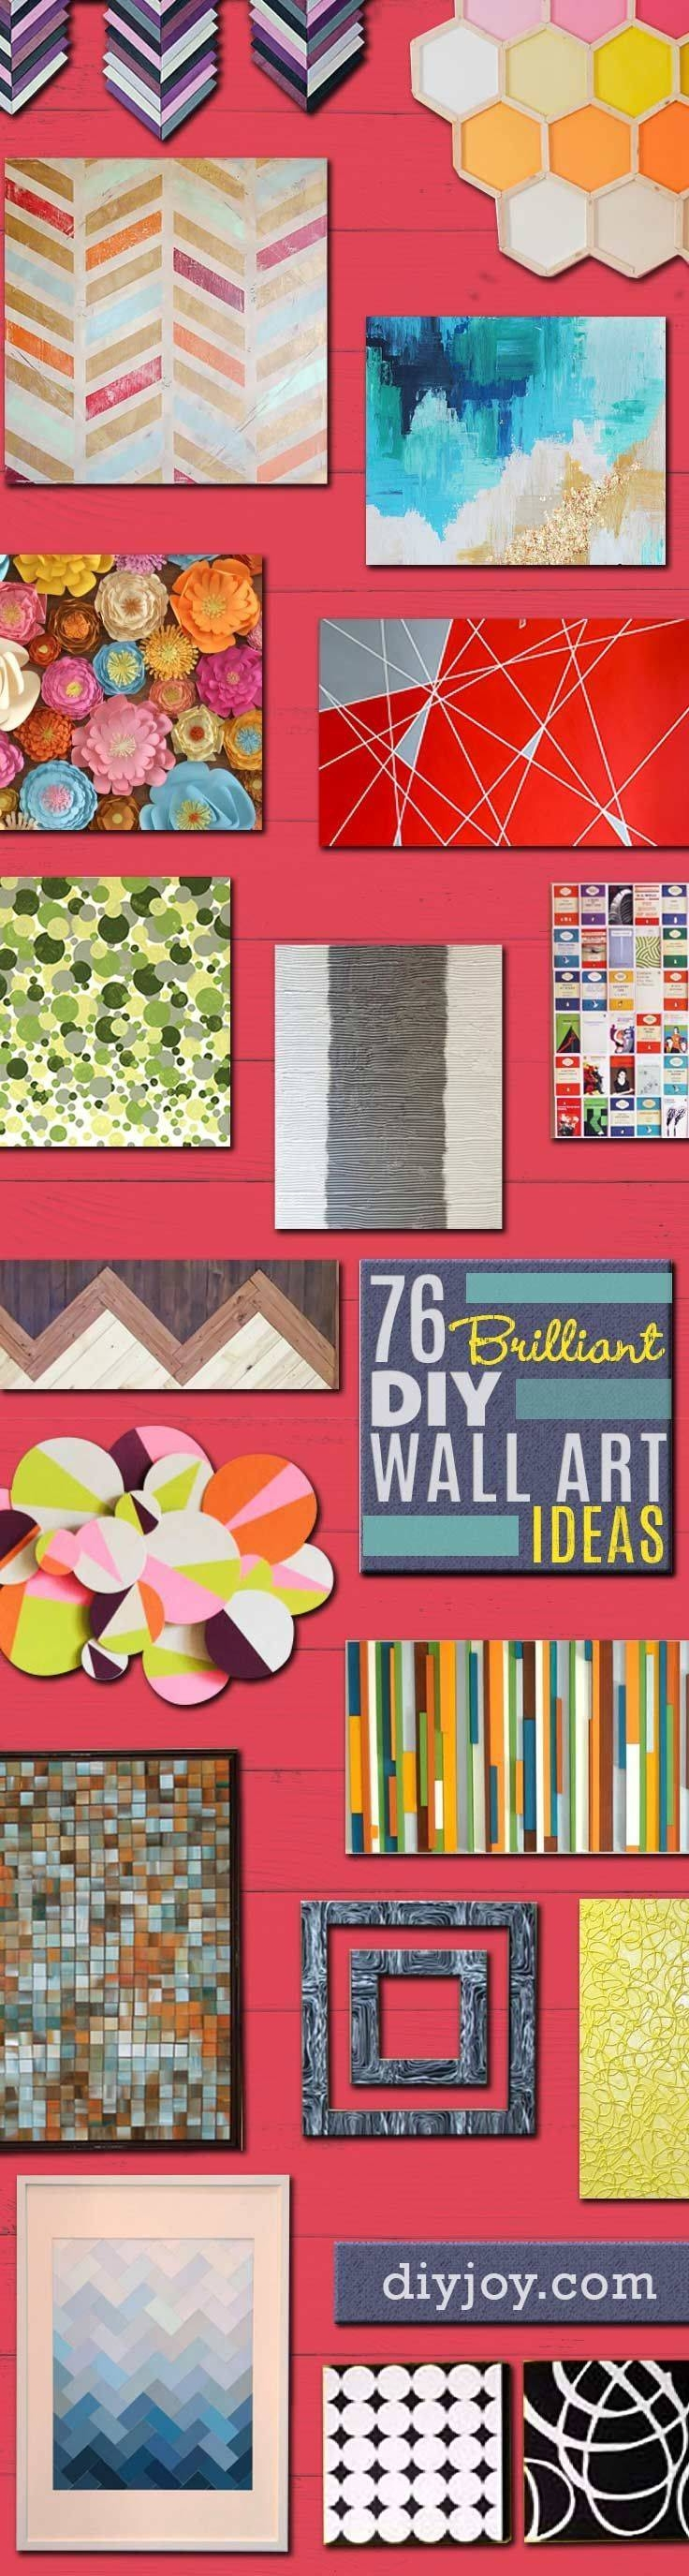 Best 25+ Wall Art Decor Ideas On Pinterest | Art Decor, Home Wall Inside Most Recently Released Pinterest Wall Art Decor (View 23 of 25)